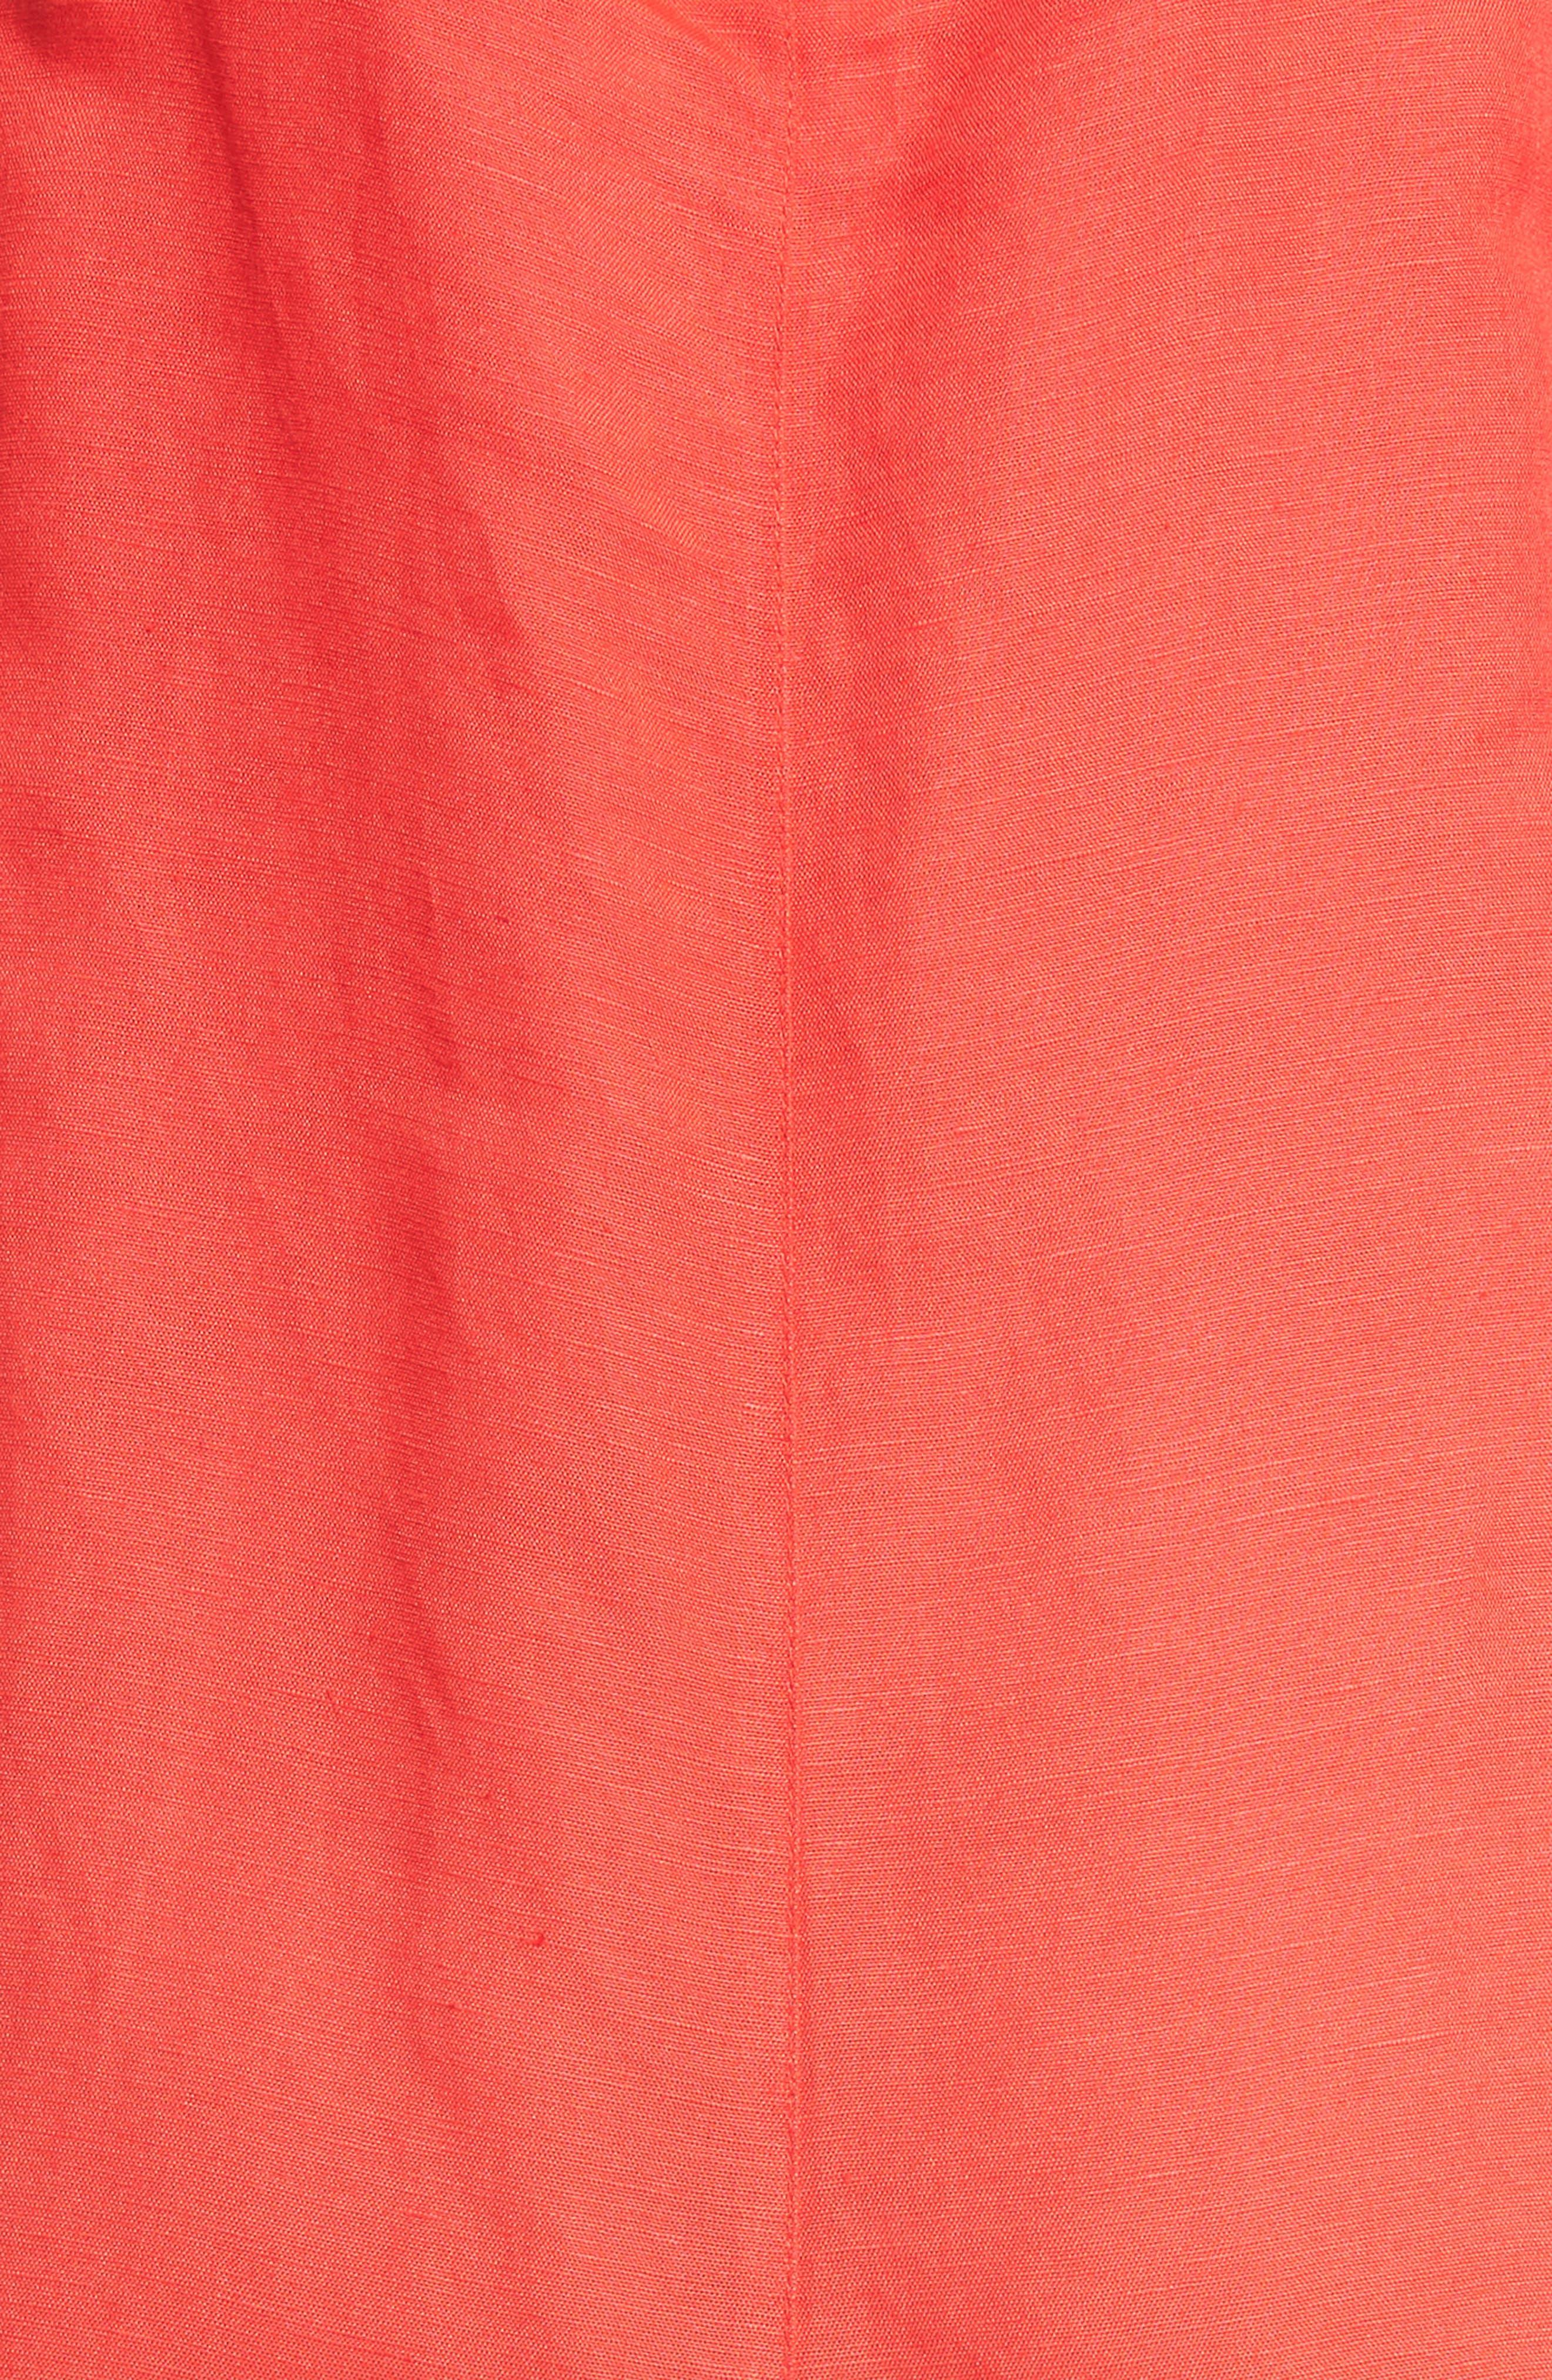 Woven Shift Dress,                             Alternate thumbnail 5, color,                             626